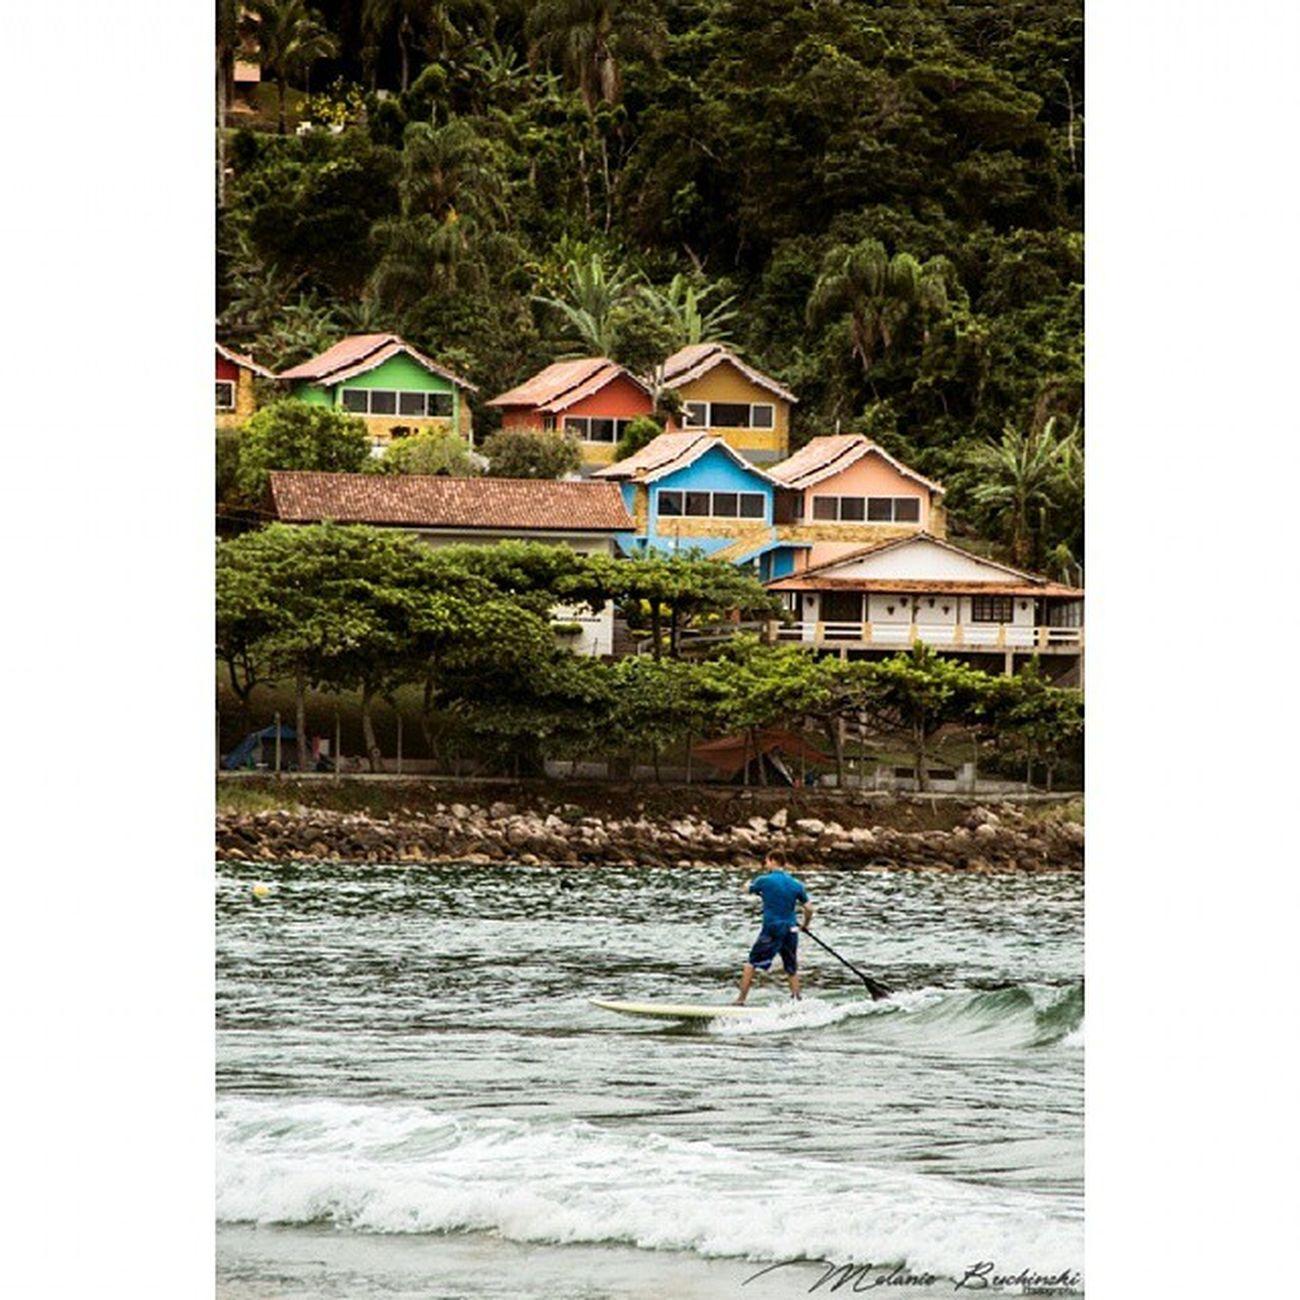 Paddle Surf Paddlesurf Praia Quatroilhas Bombinhas Ocean Sea Mar Playa Brasil Photoshoot Canon Brasil Holidays